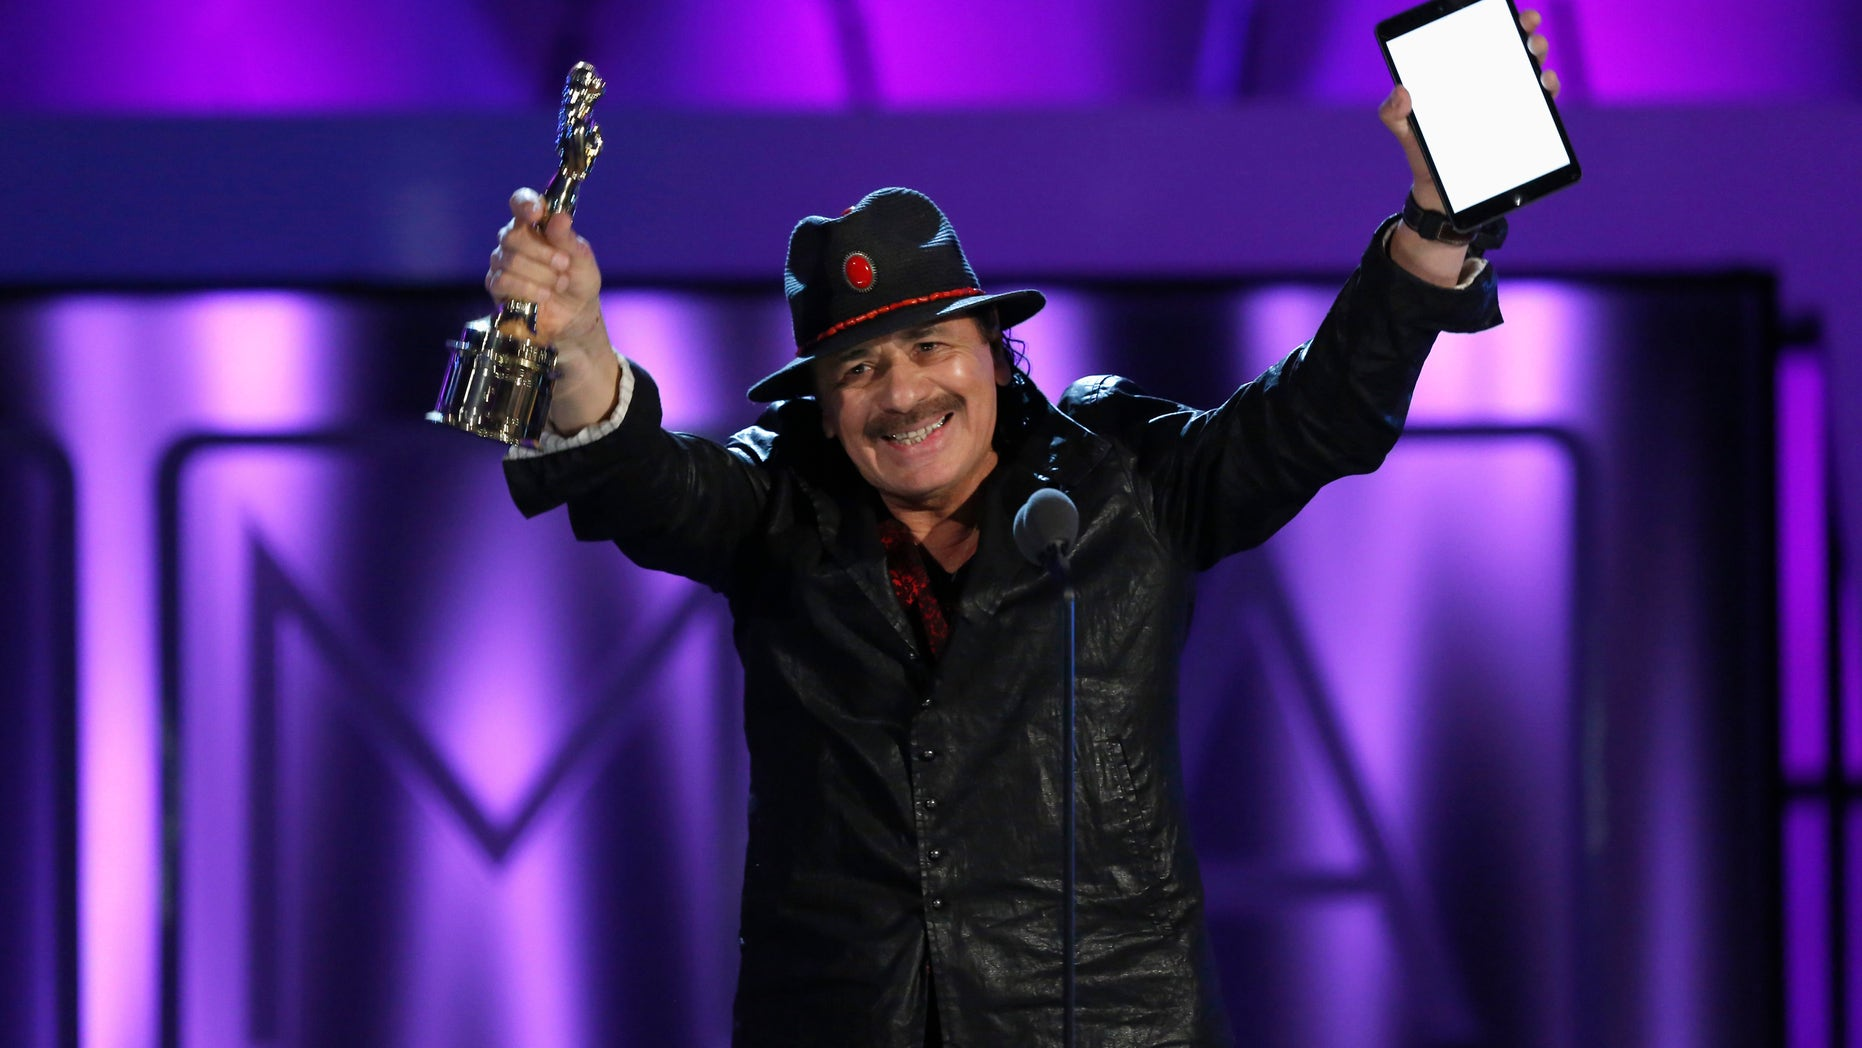 Musician Carlos Santana accepts the Outstanding Commitment to Cause and Community Award at the 2013 NCLR ALMA Awards at the Pasadena Civic Auditorium in Pasadena, California September 27, 2013.